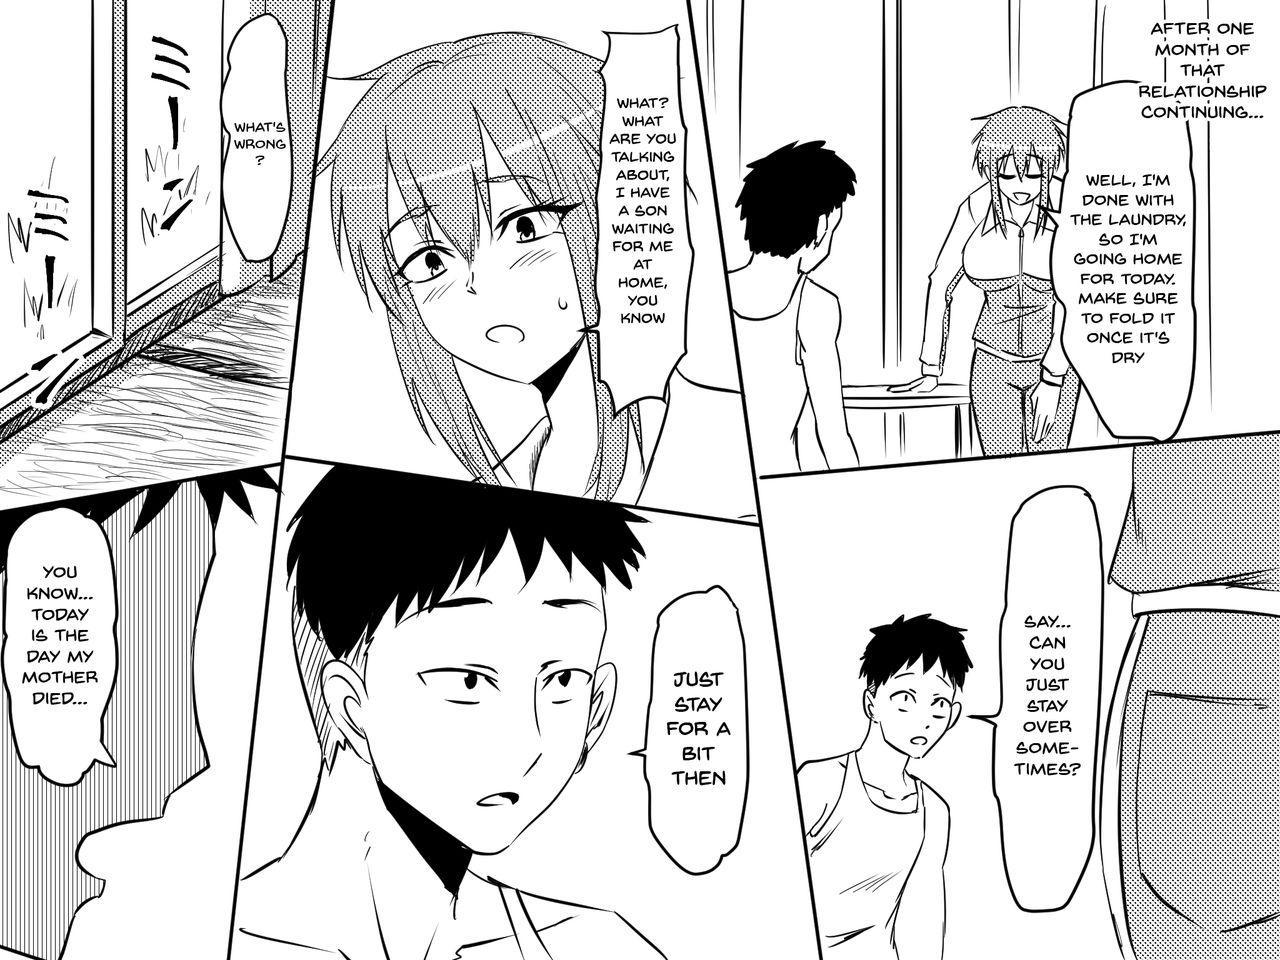 [Mikezoutei] Netorare Haha ~Kachiki de Kimottama no Okaa-san ga Boku o Ijimeru Aitsu no Onna ni Naru Hanashi~   Mom NTR ~A Story Of How My Gutsy Mom Ended Up Becoming My Bully's Plaything~ [English] {Doujins.com} 39